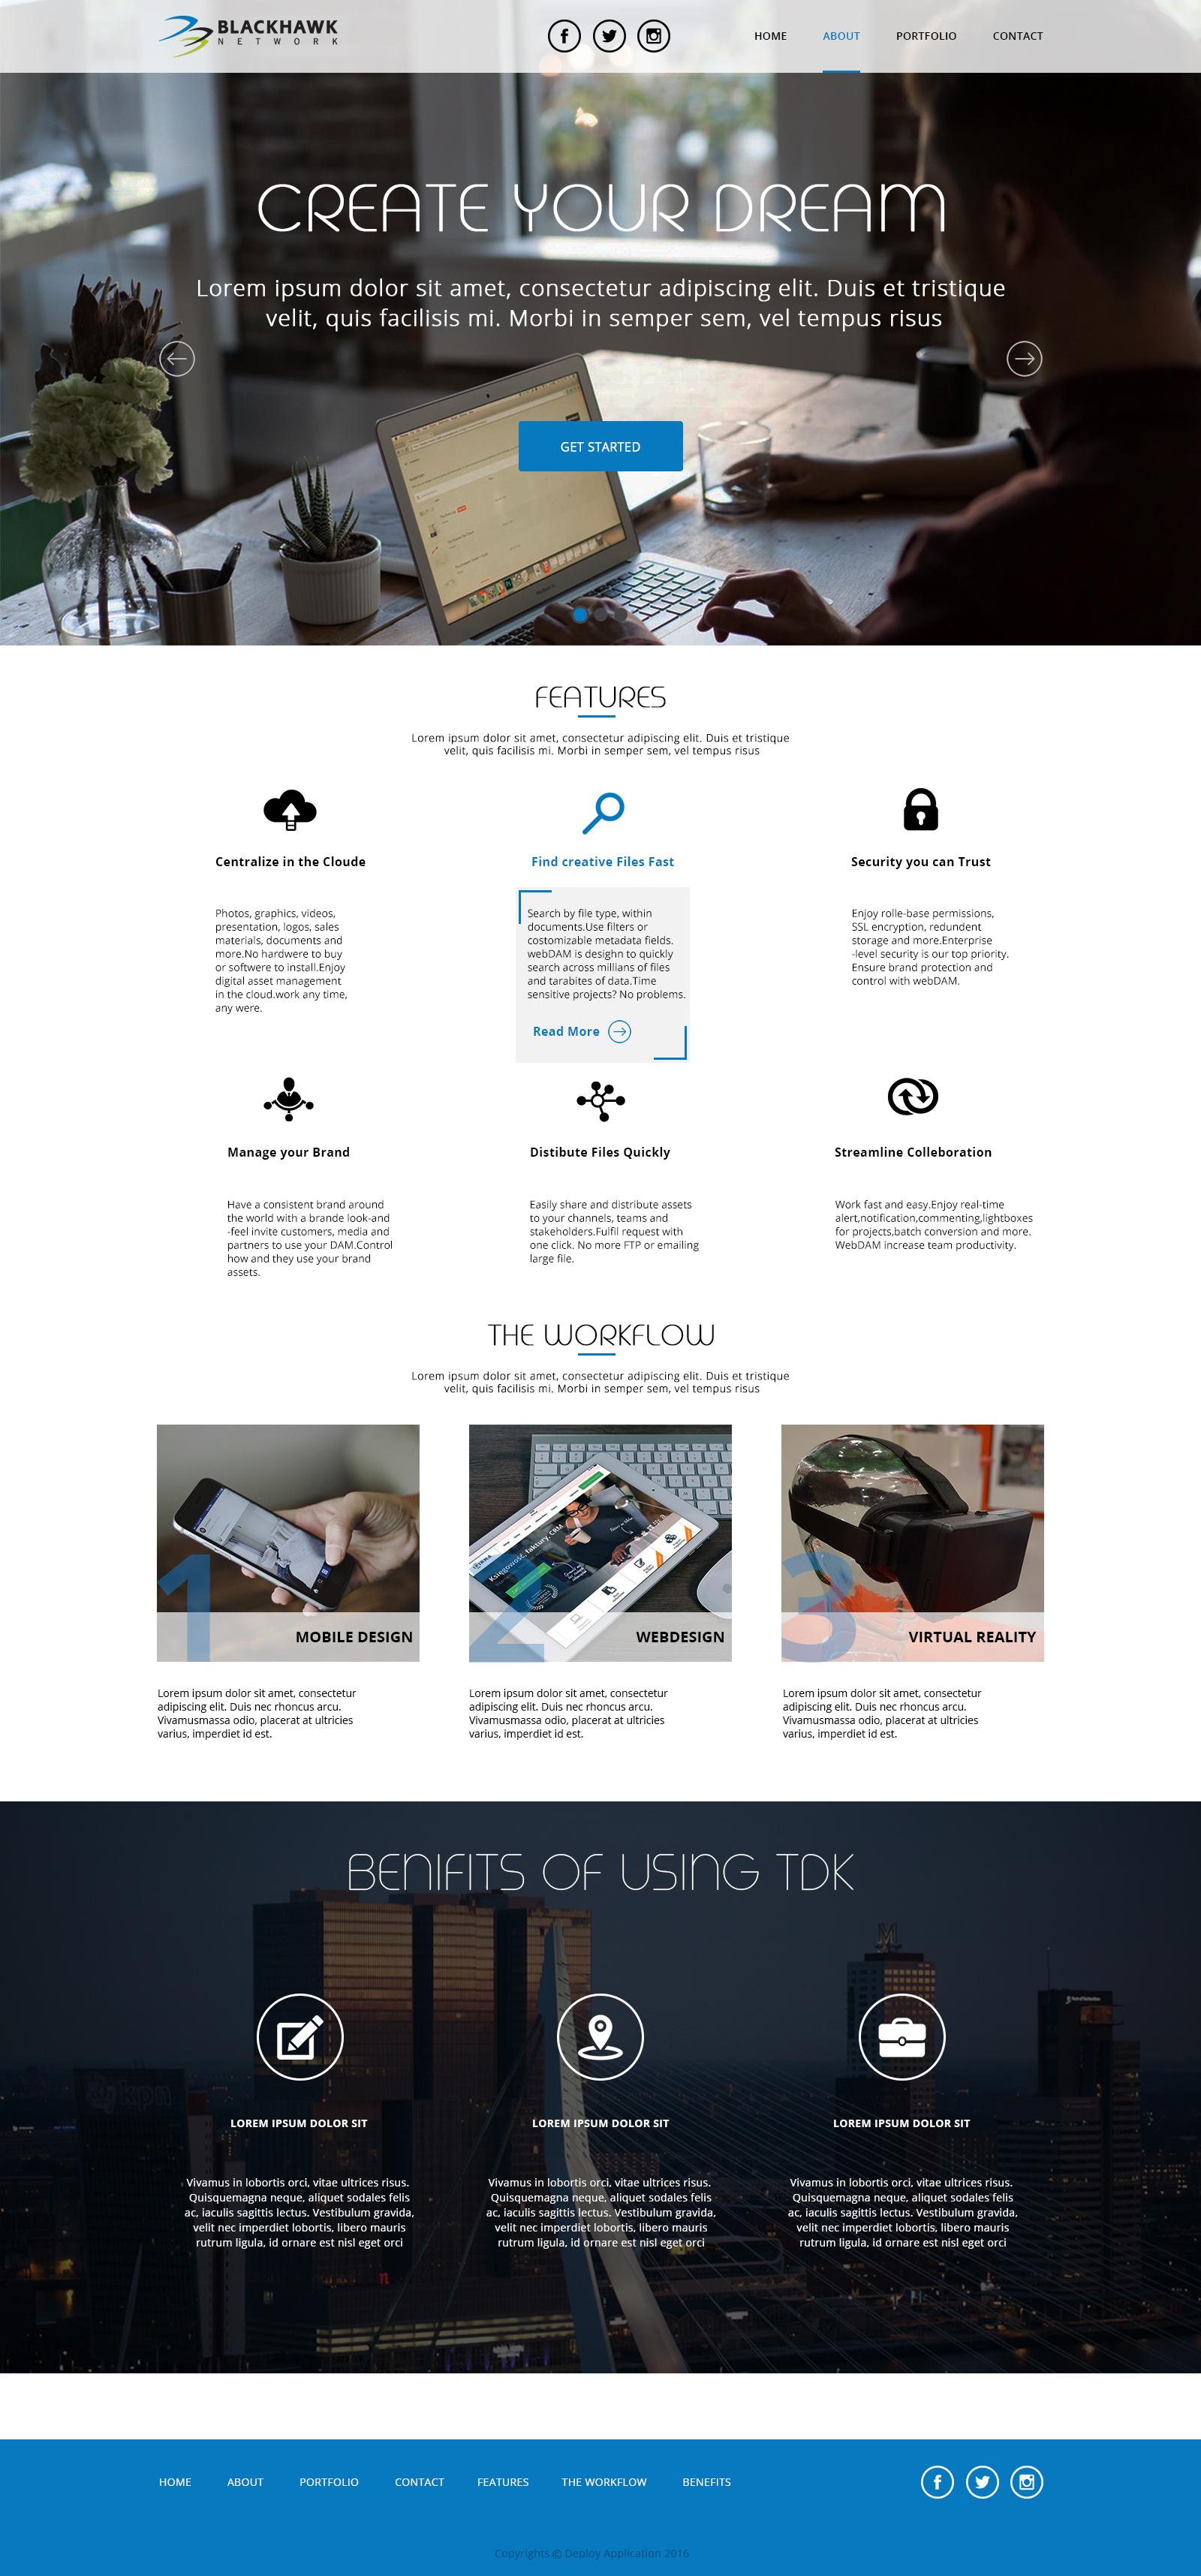 Web Page Design Design By Our Creative Designer Raees Webpagedesign Designhill Websitedesigner Webpage Design Webpage Layout Web Template Design